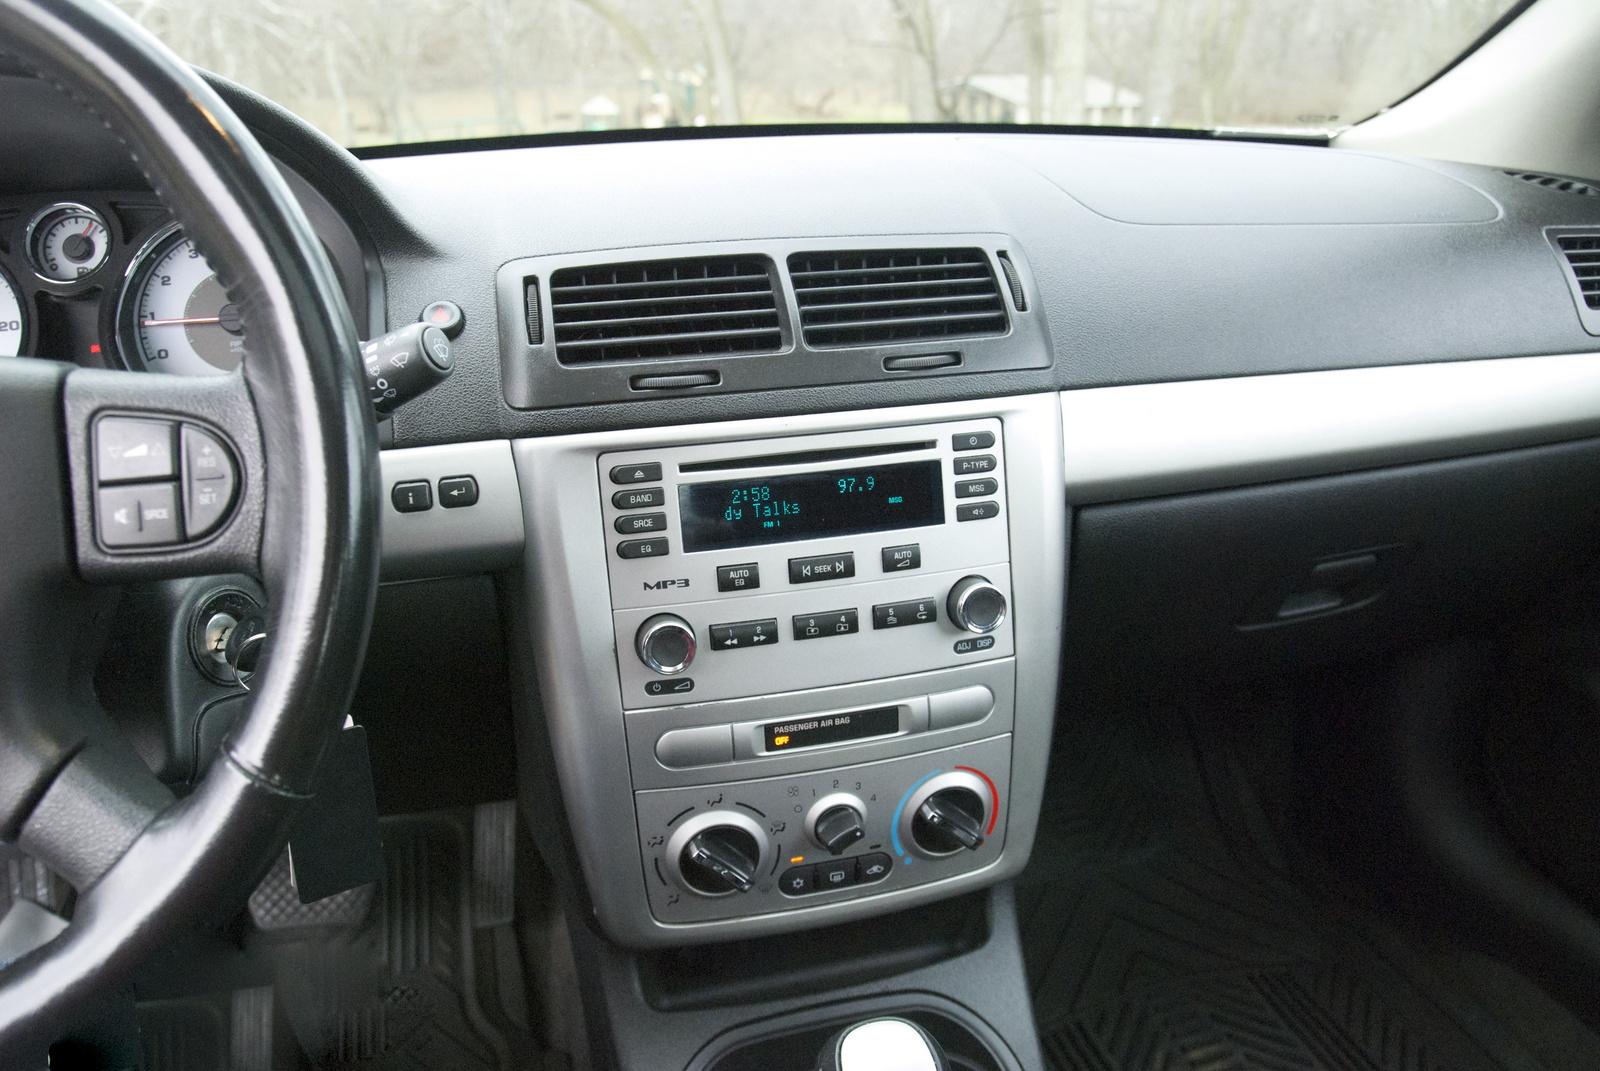 2013 chevy cobalt coupe interior pictures autos weblog